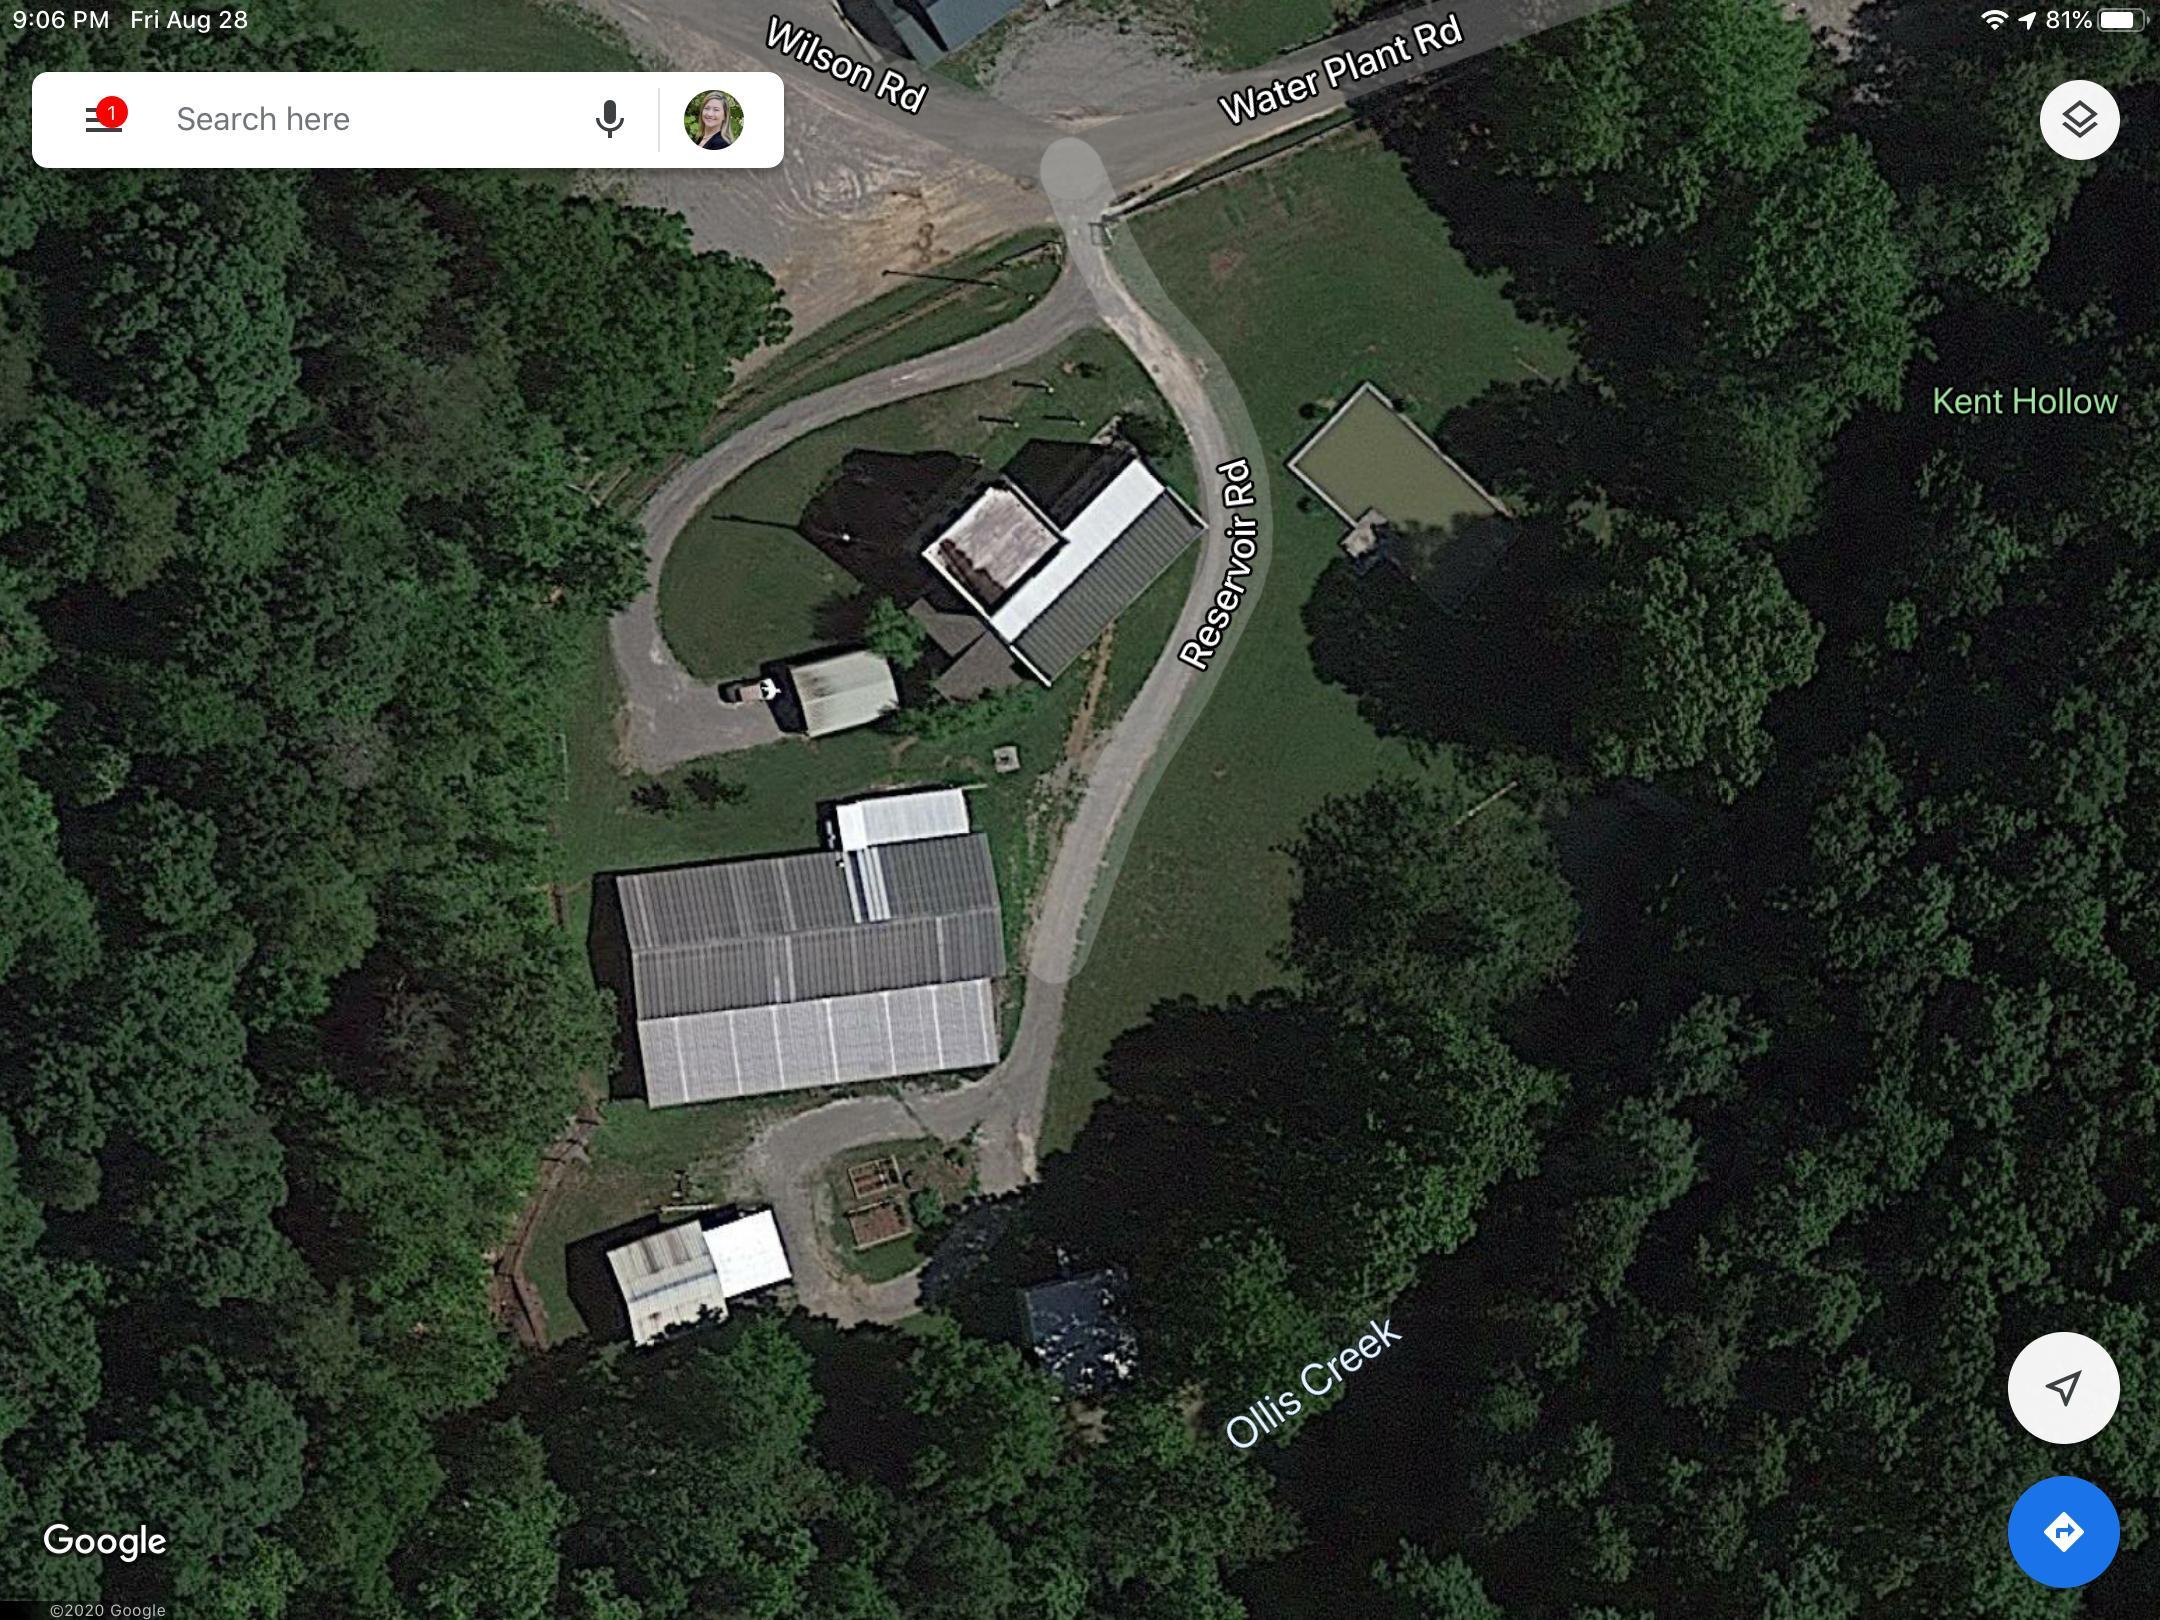 137 Water Plant Lane: